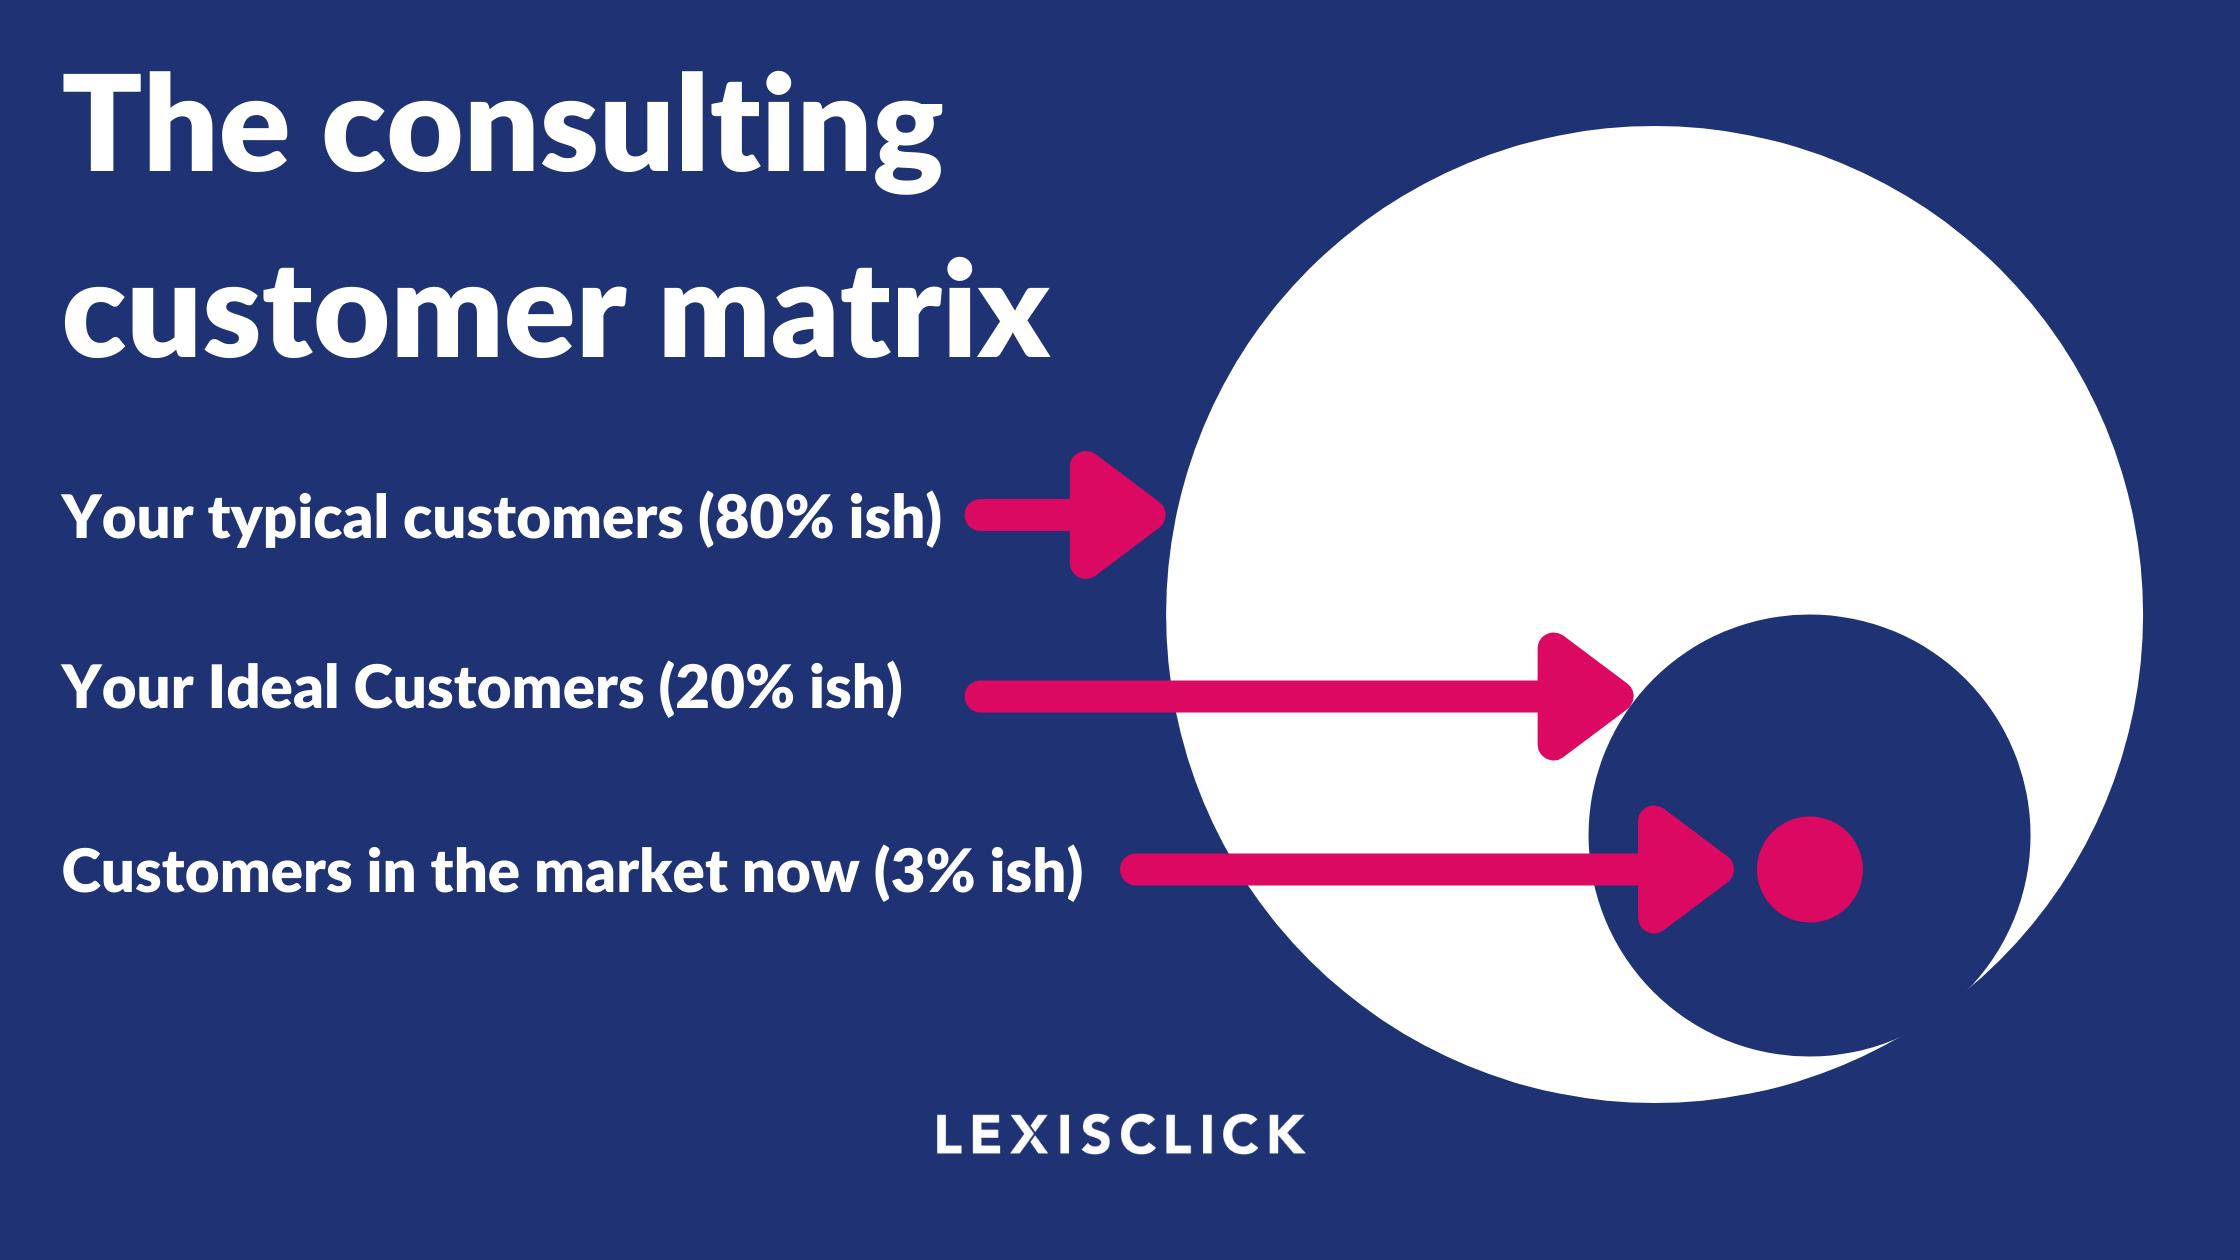 The consulting customer matrix